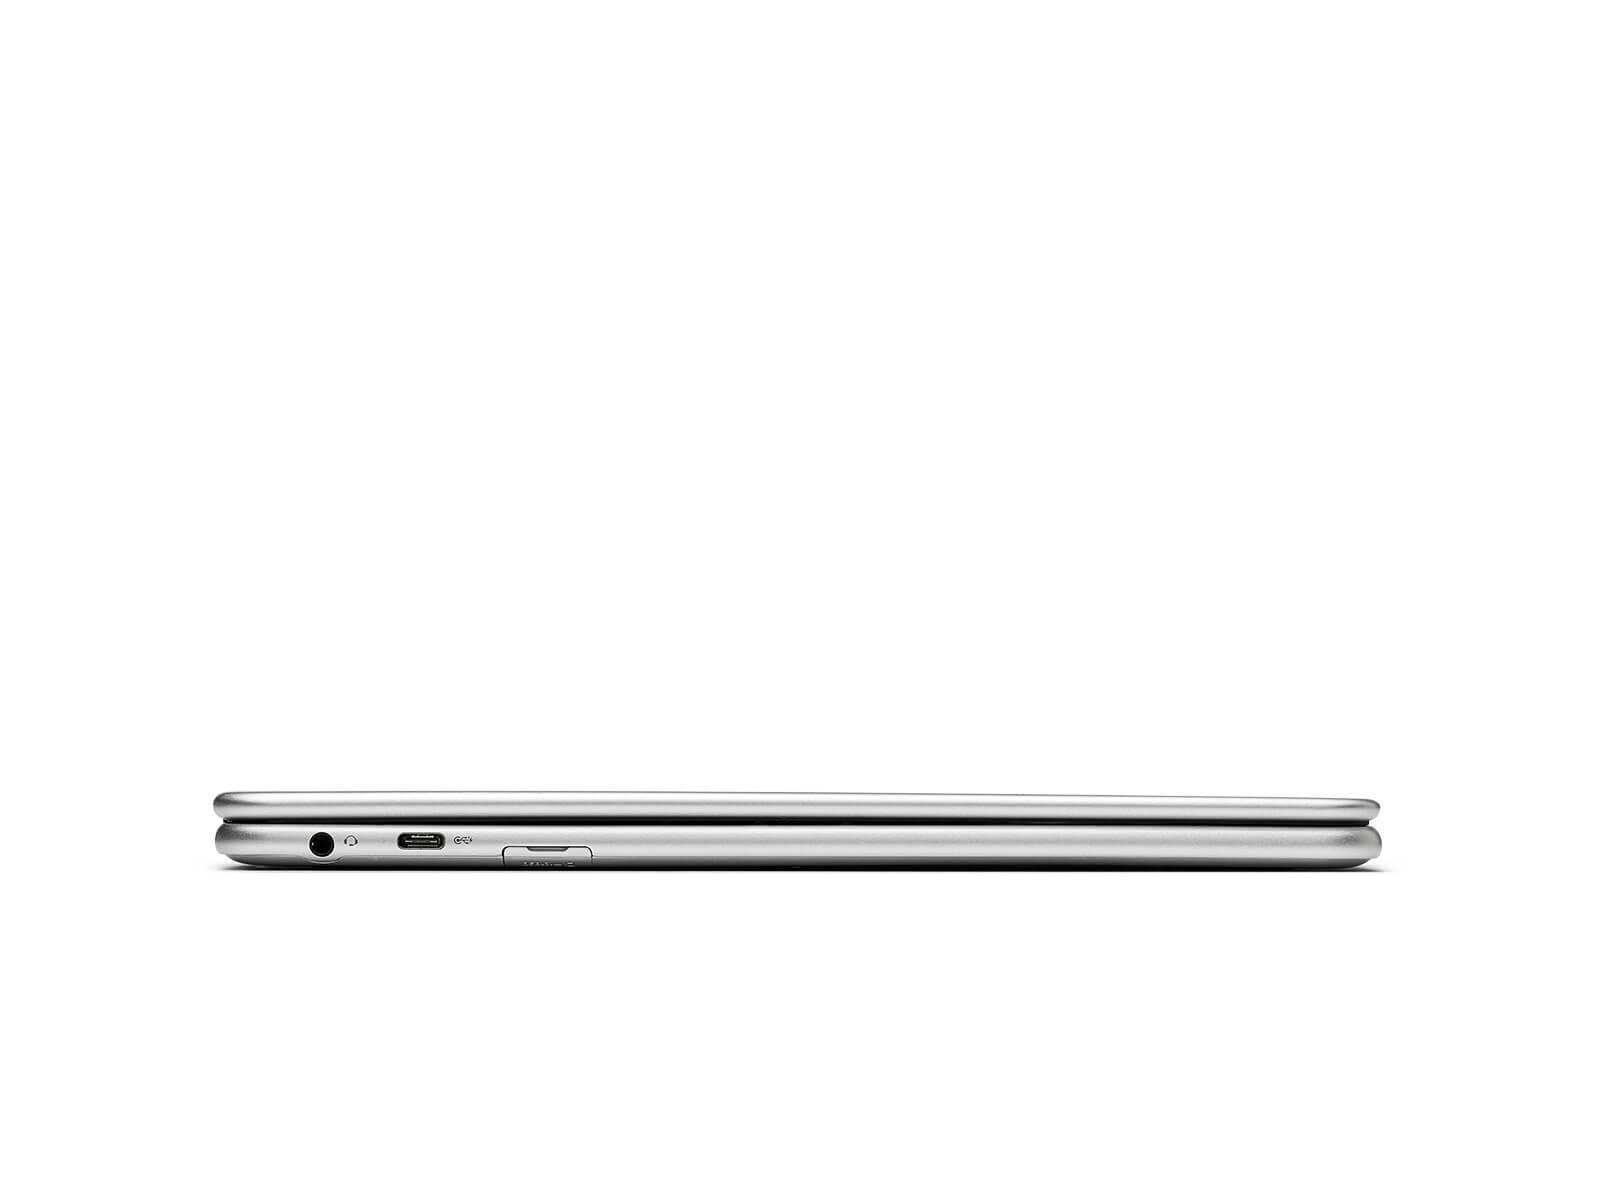 Samsung Chromebook Plus - photo 10